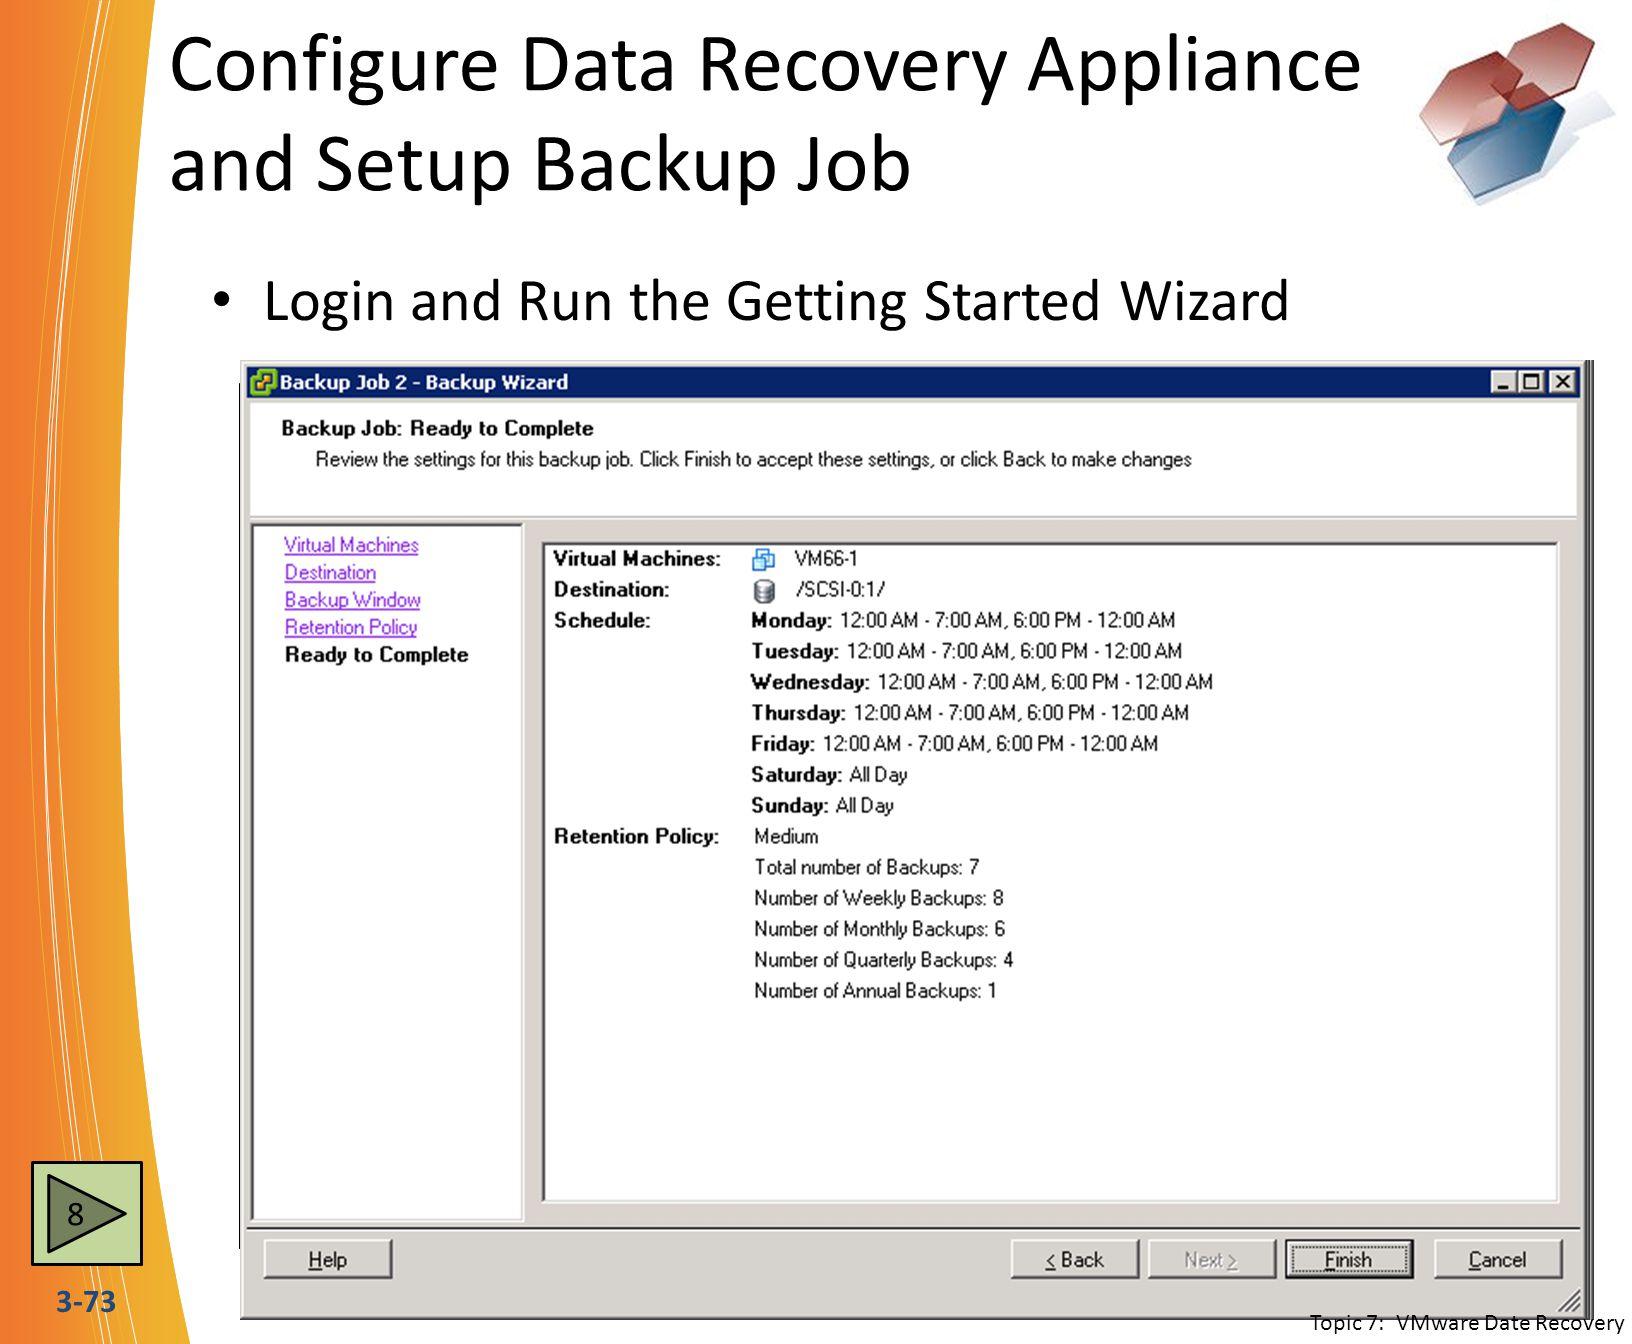 Configure Data Recovery Appliance and Setup Backup Job